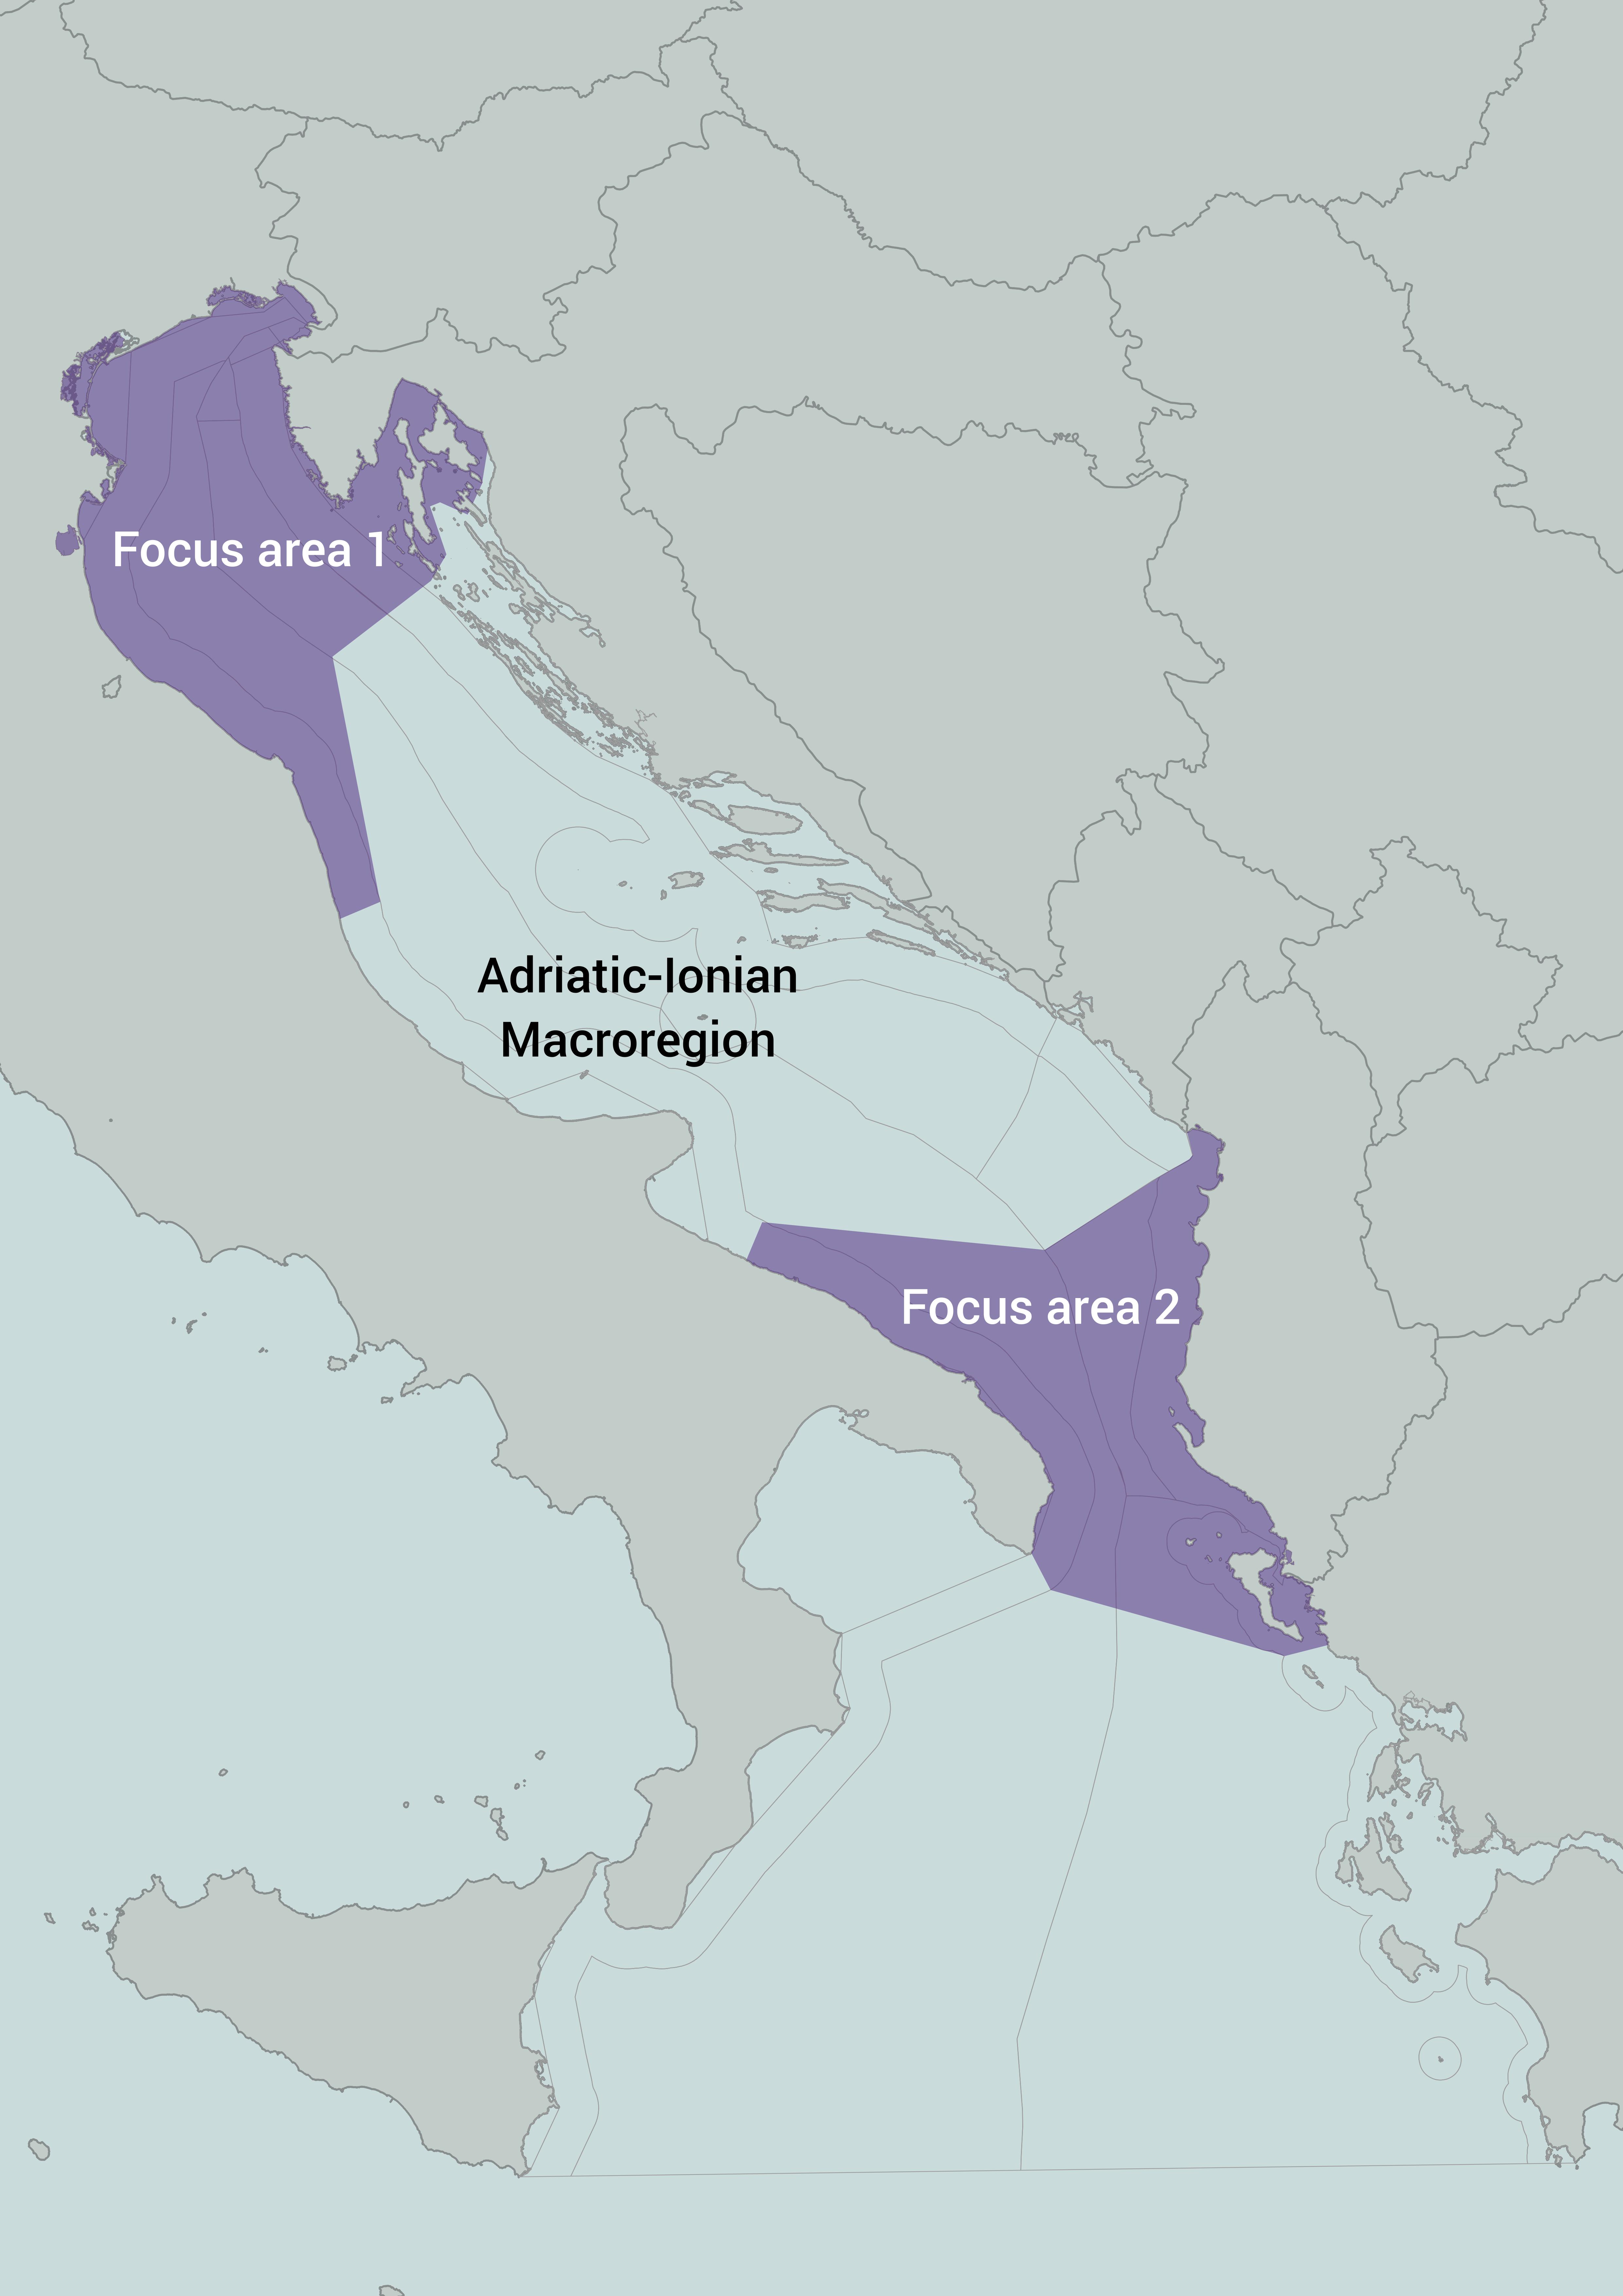 ADRIPLAN study area: Adriatic-Ionian Region and Focus Areas. Source: ADRIPLAN project